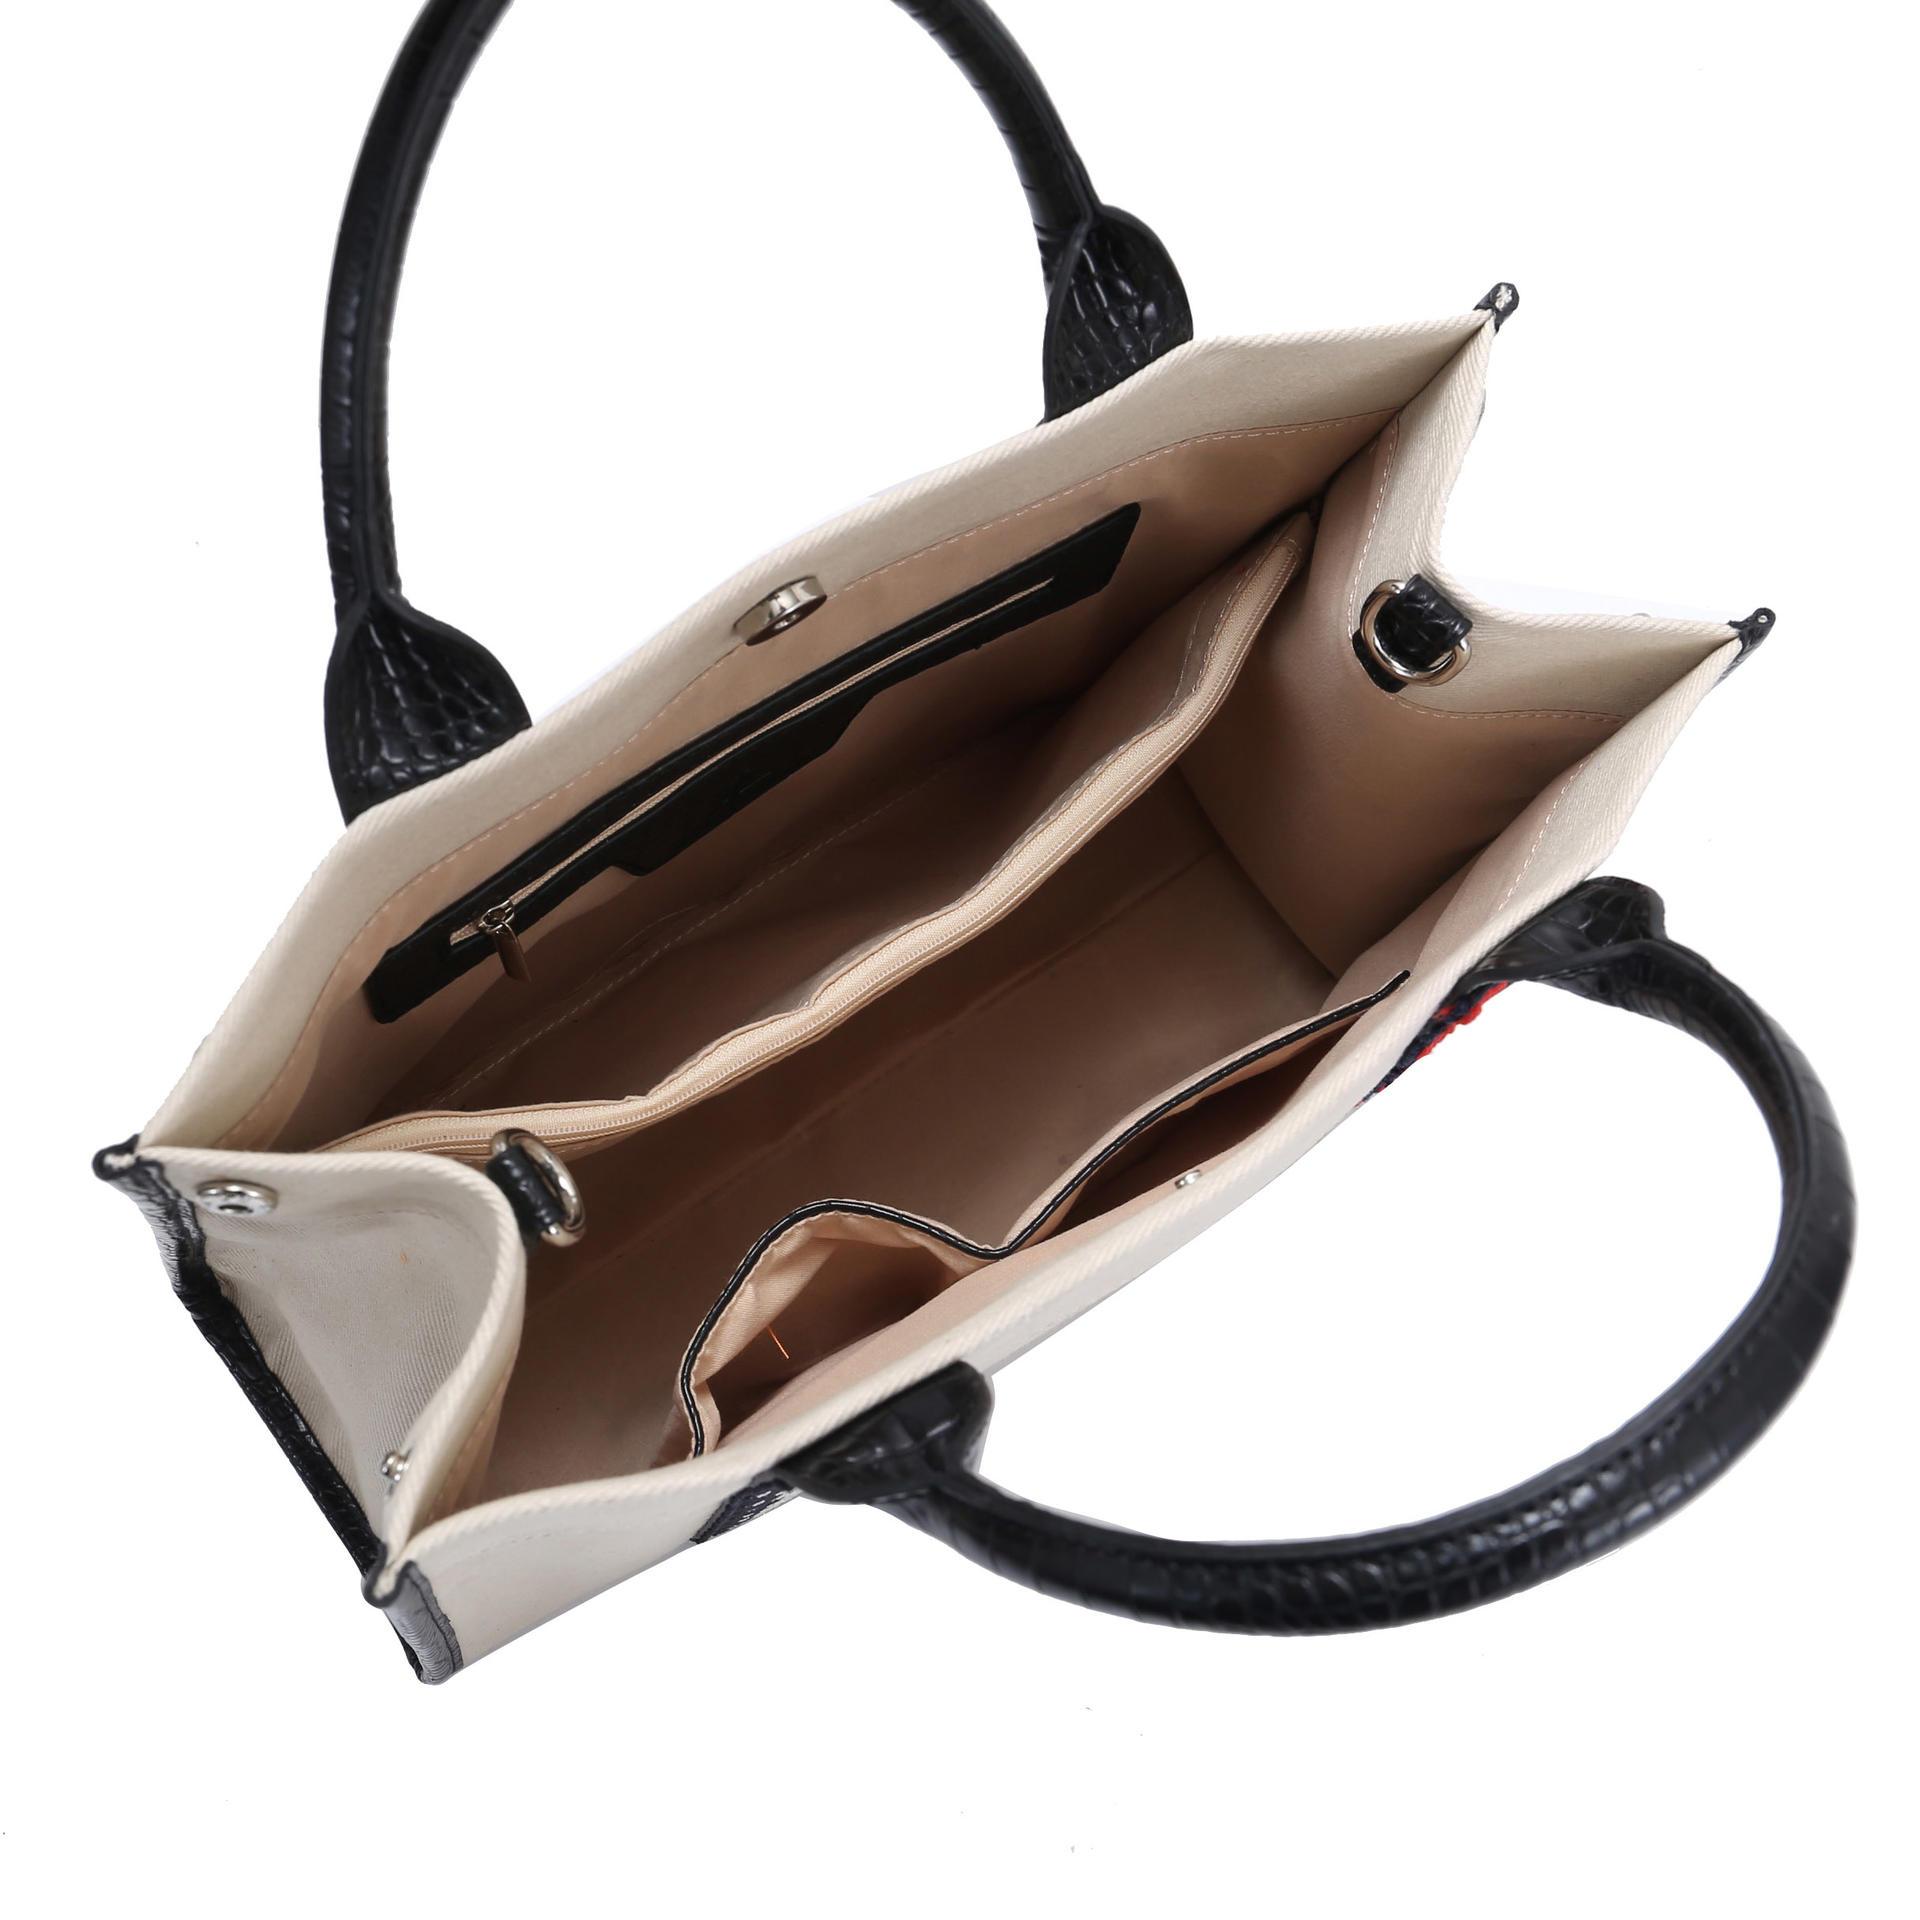 Fashion Canvas Bag Cross Body Bags Women Tote Handbag with PU Handle